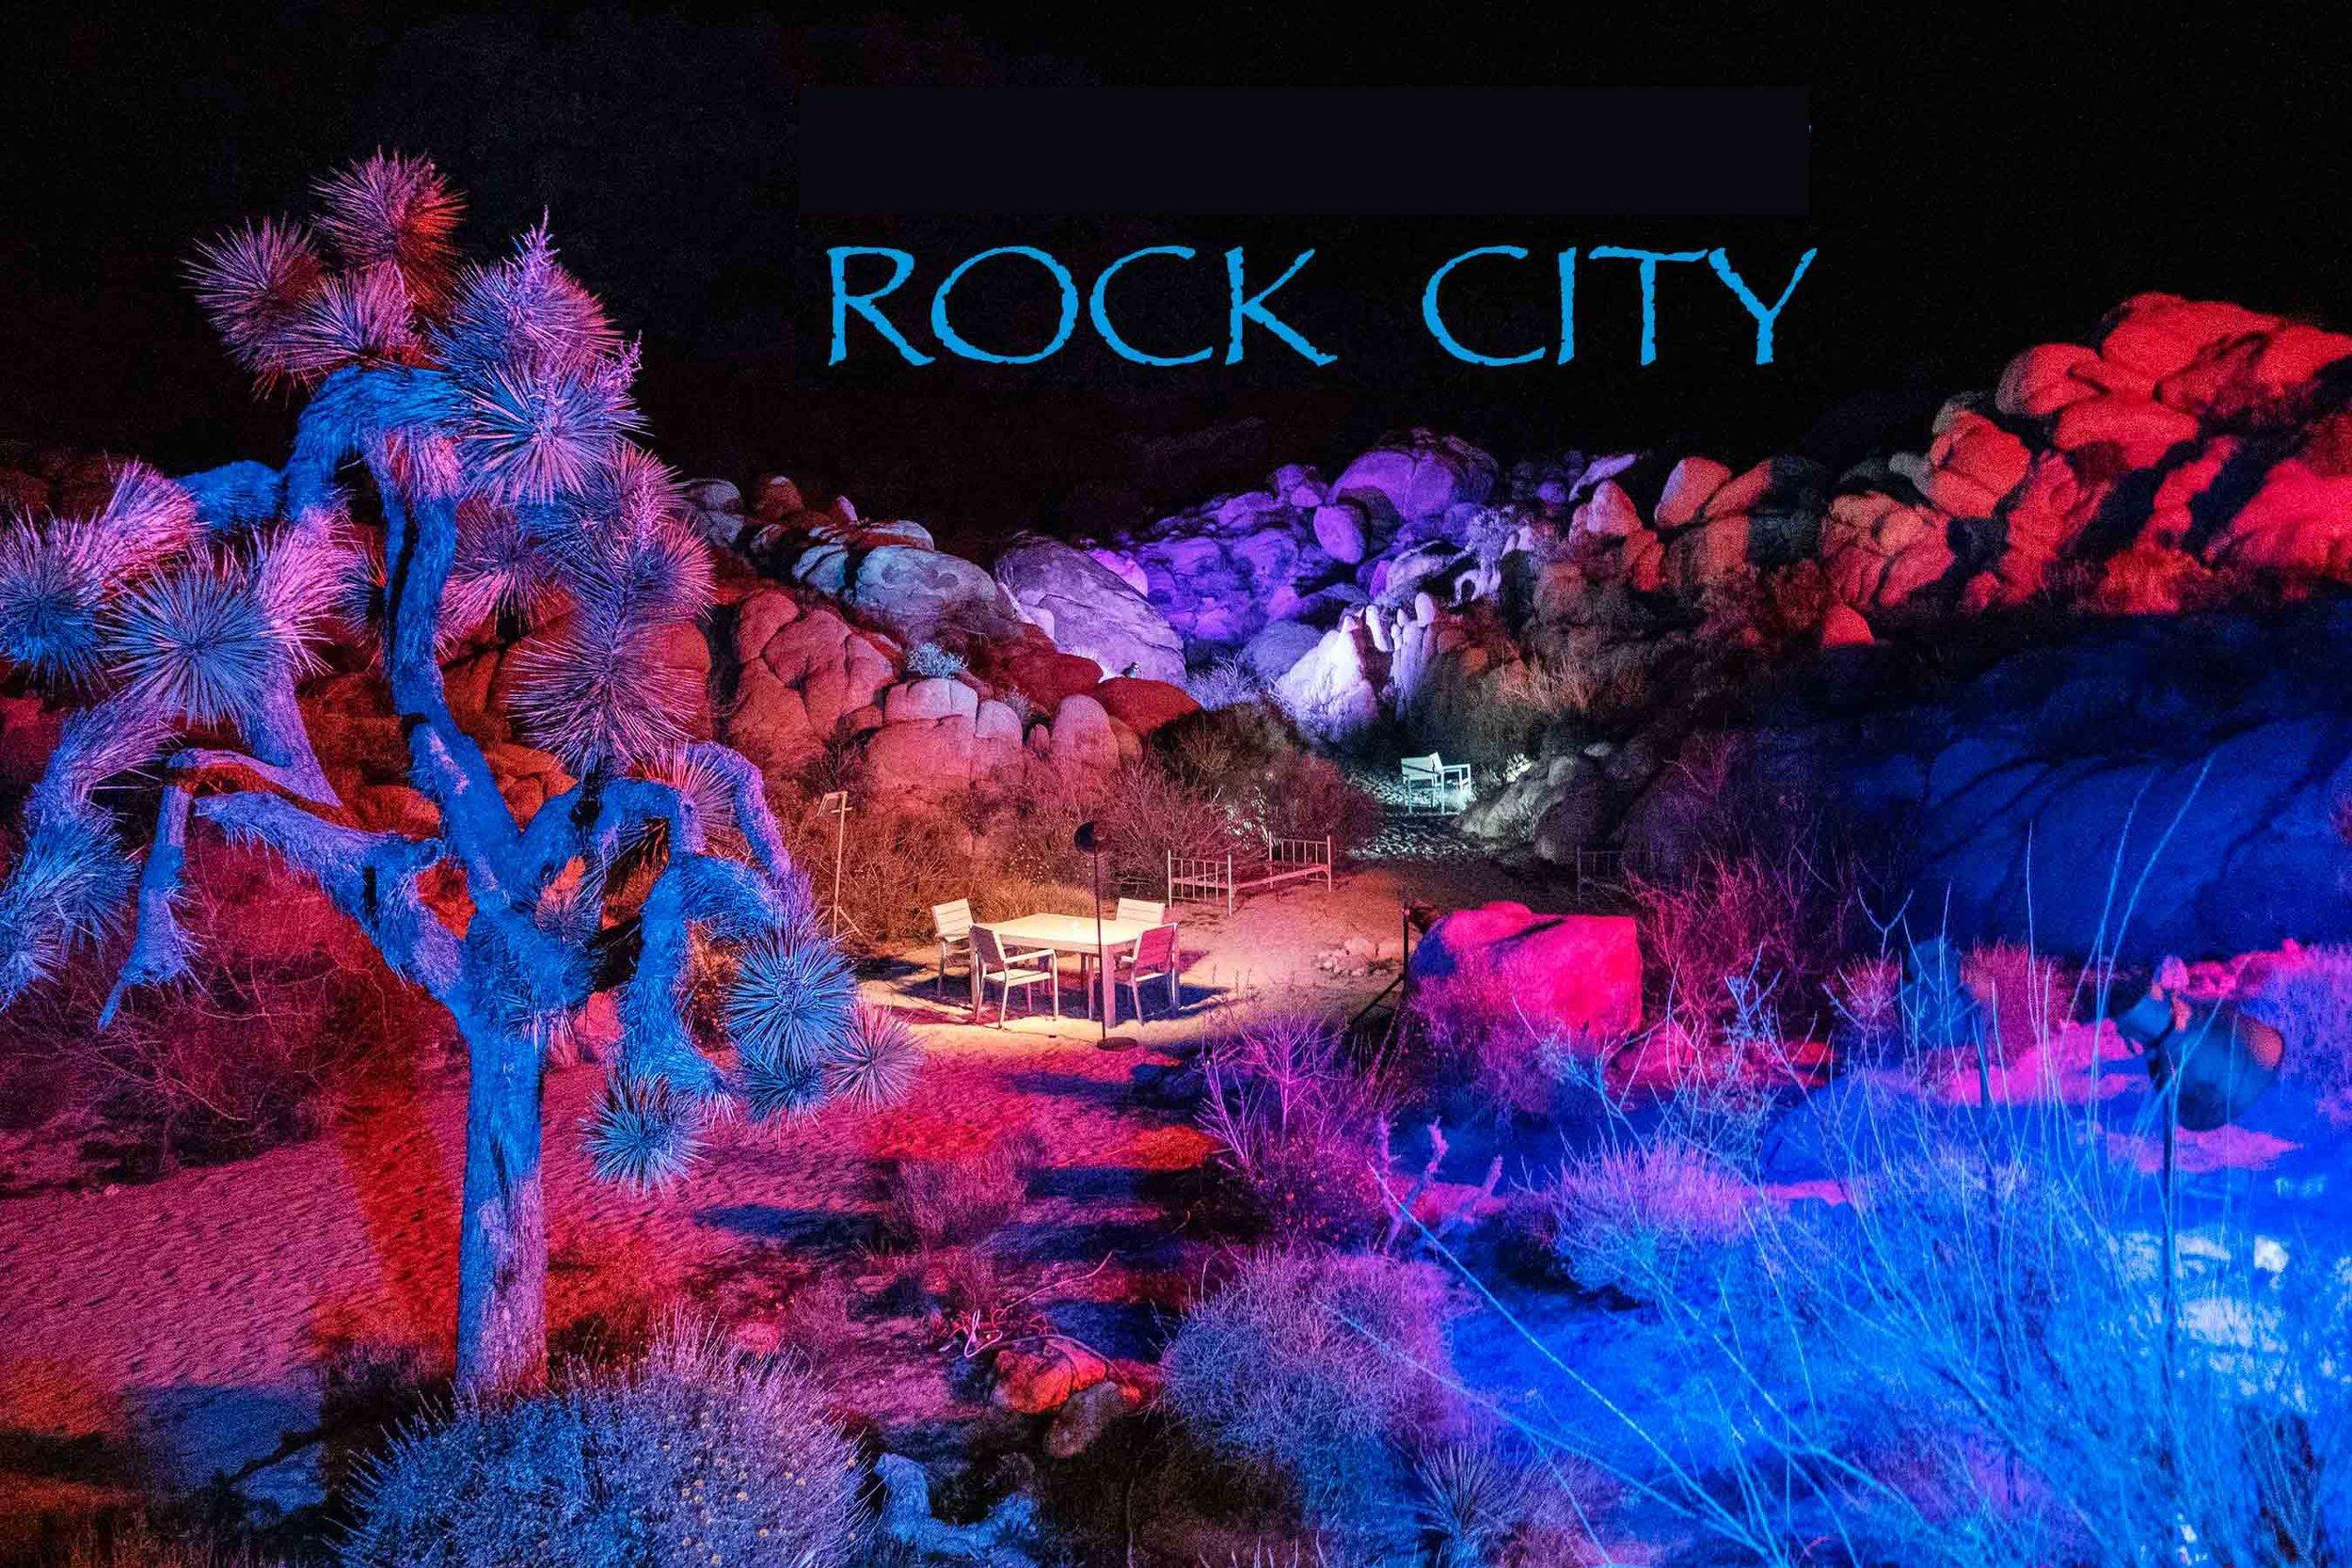 rock-city.-2222-light.-r-Chairs-in-Wash--1-11-19-MPP05375-CUT.jpg